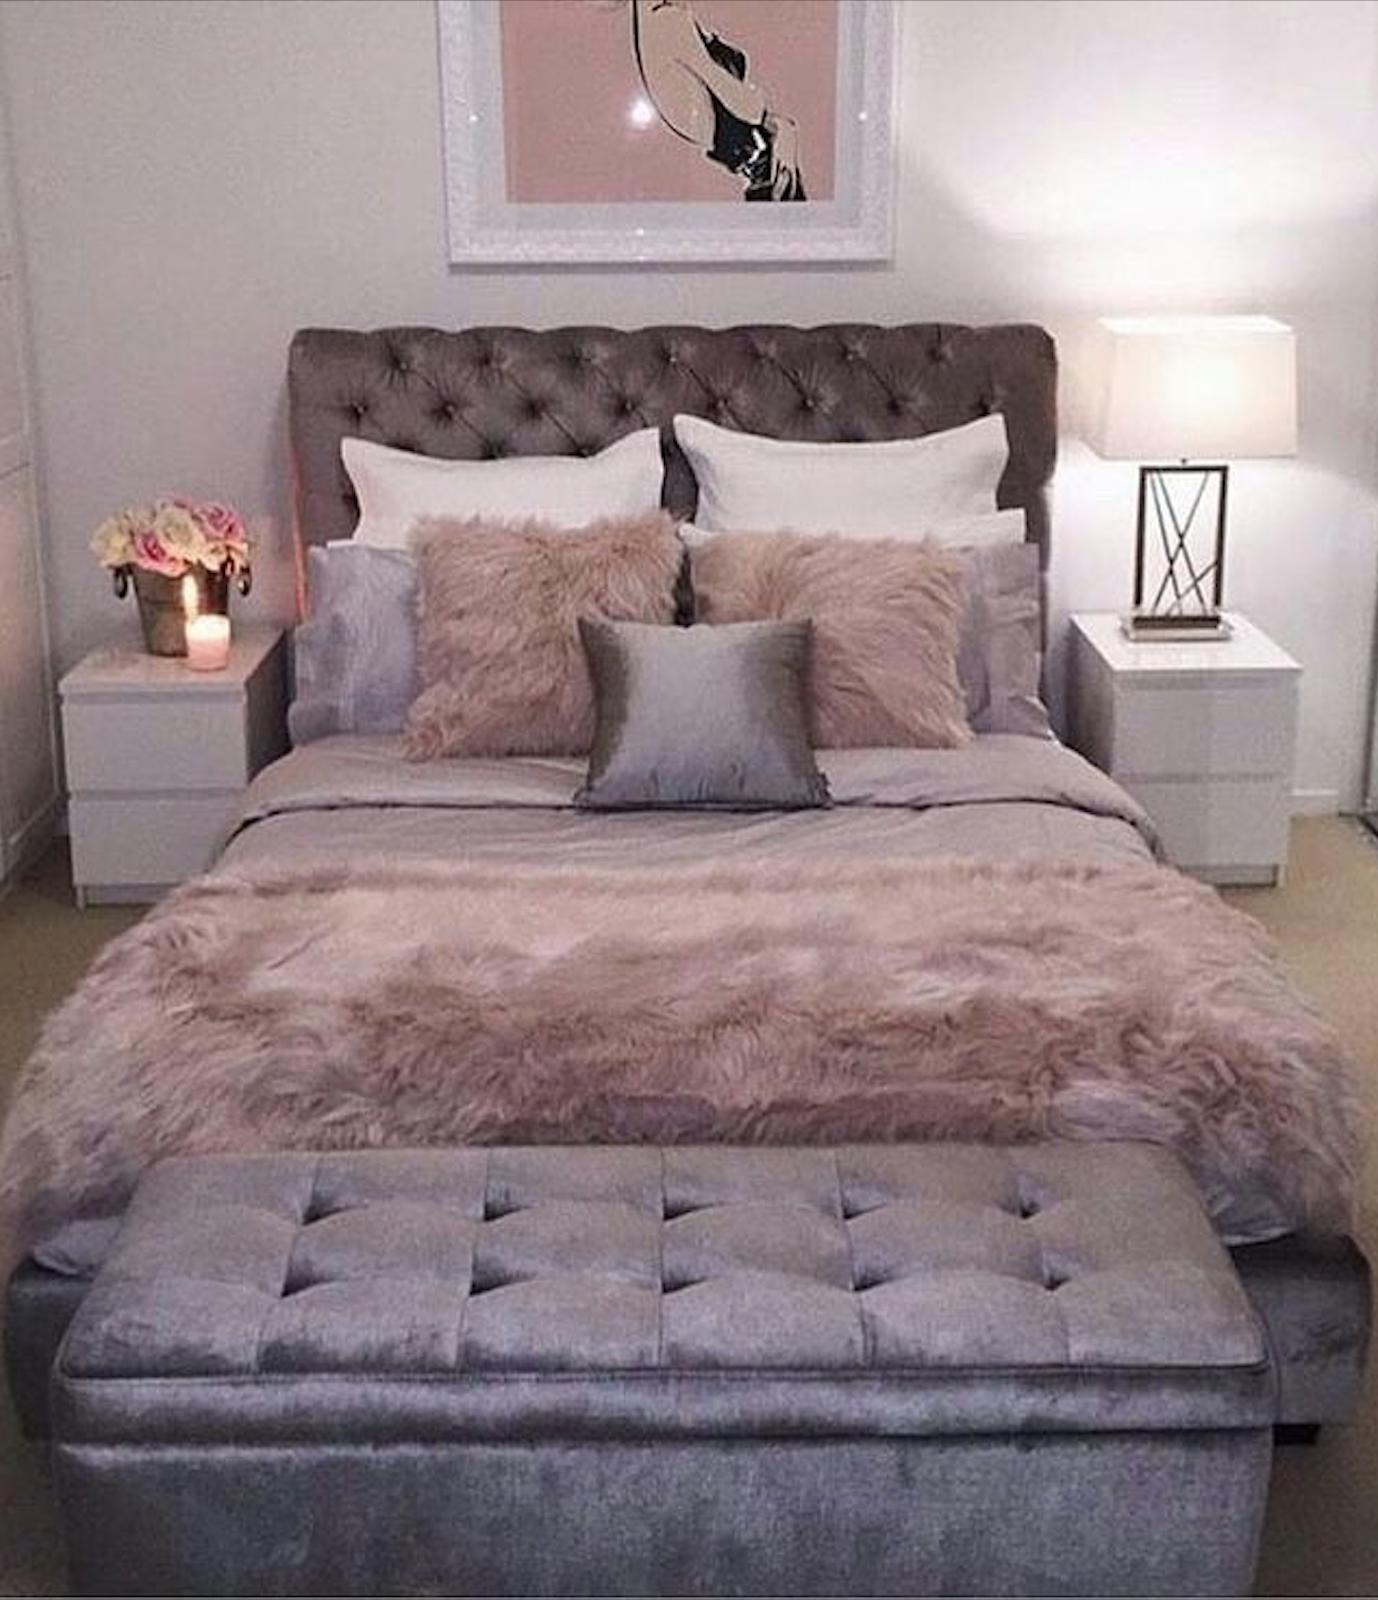 Bedroom Diy Decor According To Your Personality Bedroom Design Home Decor Apartment Decor